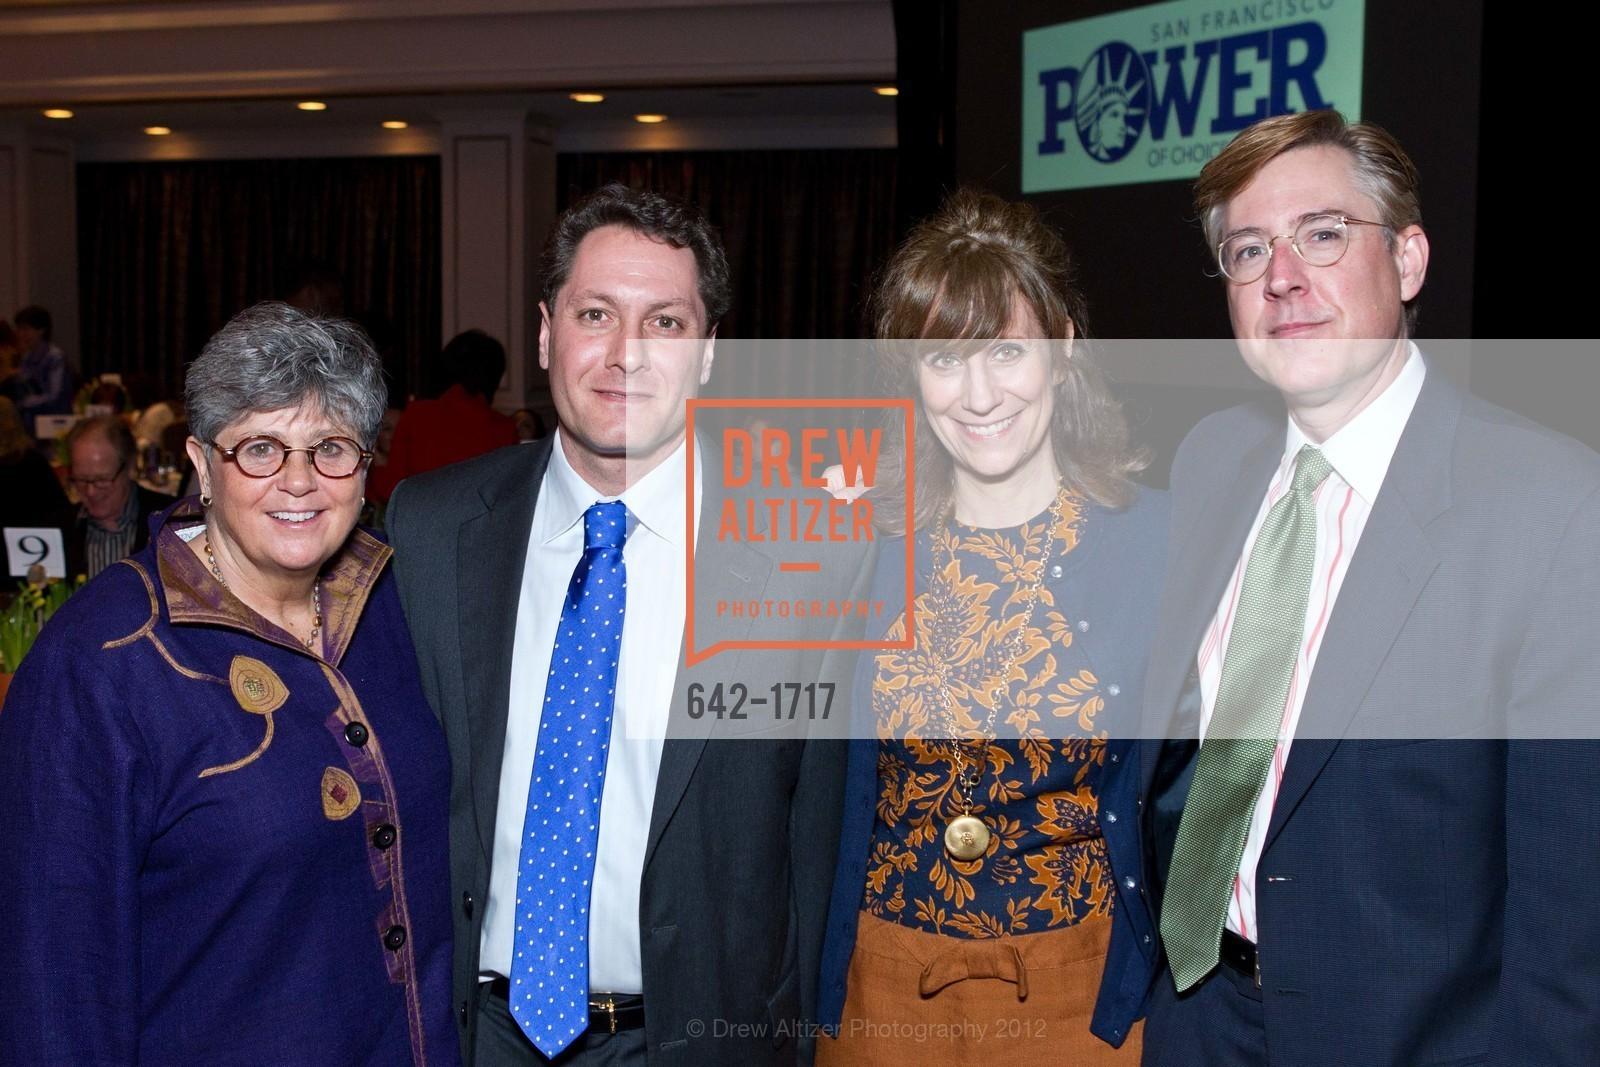 Nancy Keenan, Todd Stave, Lizz Winstead, Thomas Frank, Photo #642-1717